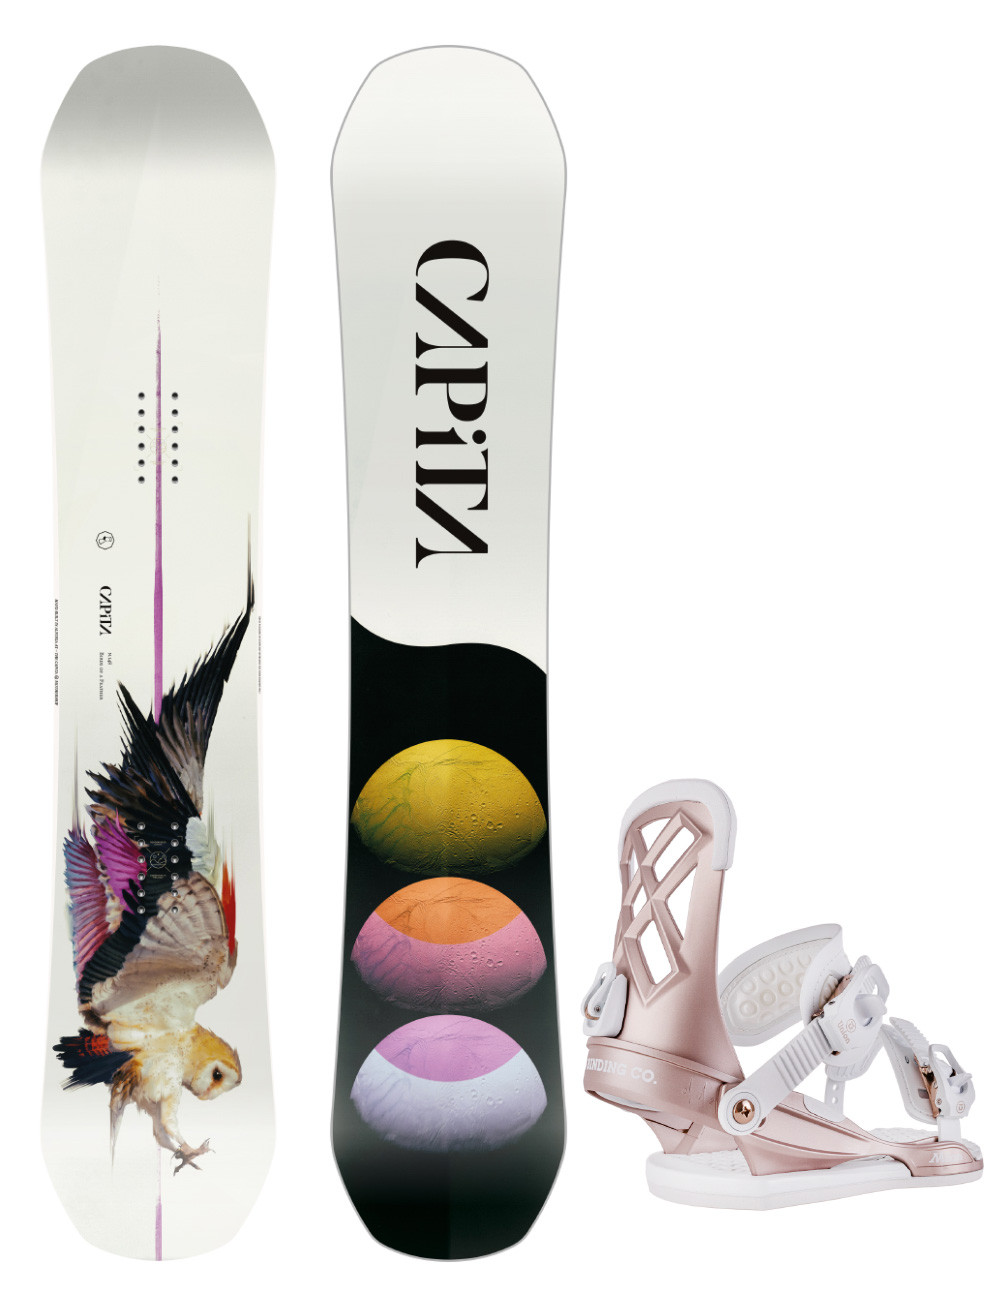 Zestaw Capita Birds Of A Feather + Union Milan M